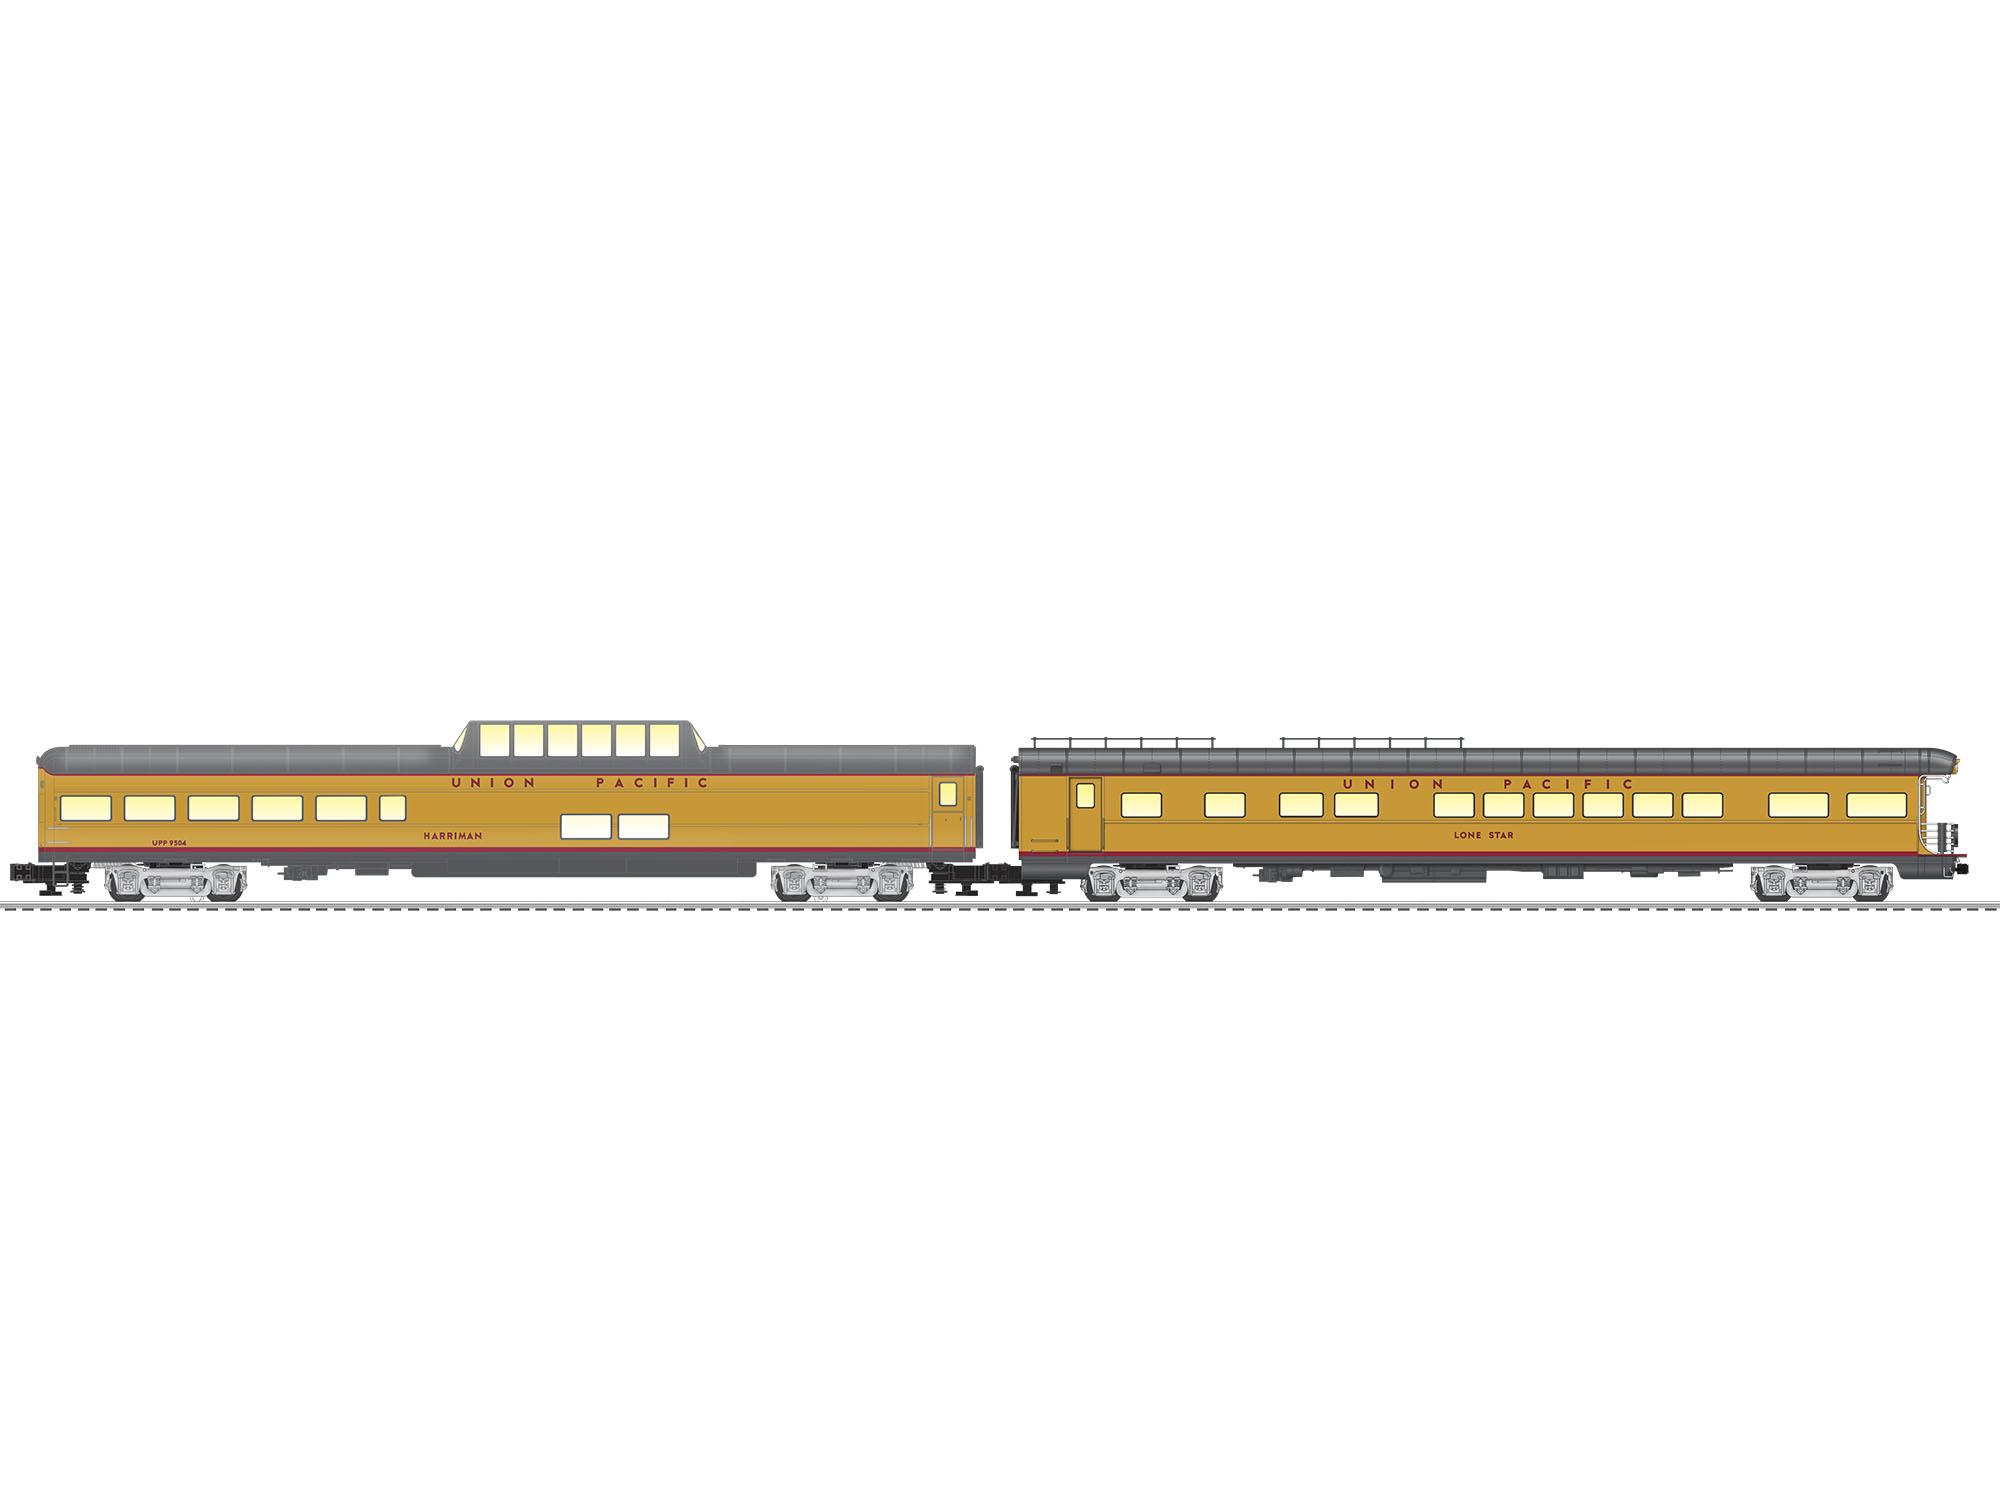 LNL2027240 Lionel O UP Excursion 4 Pack 434-2027240